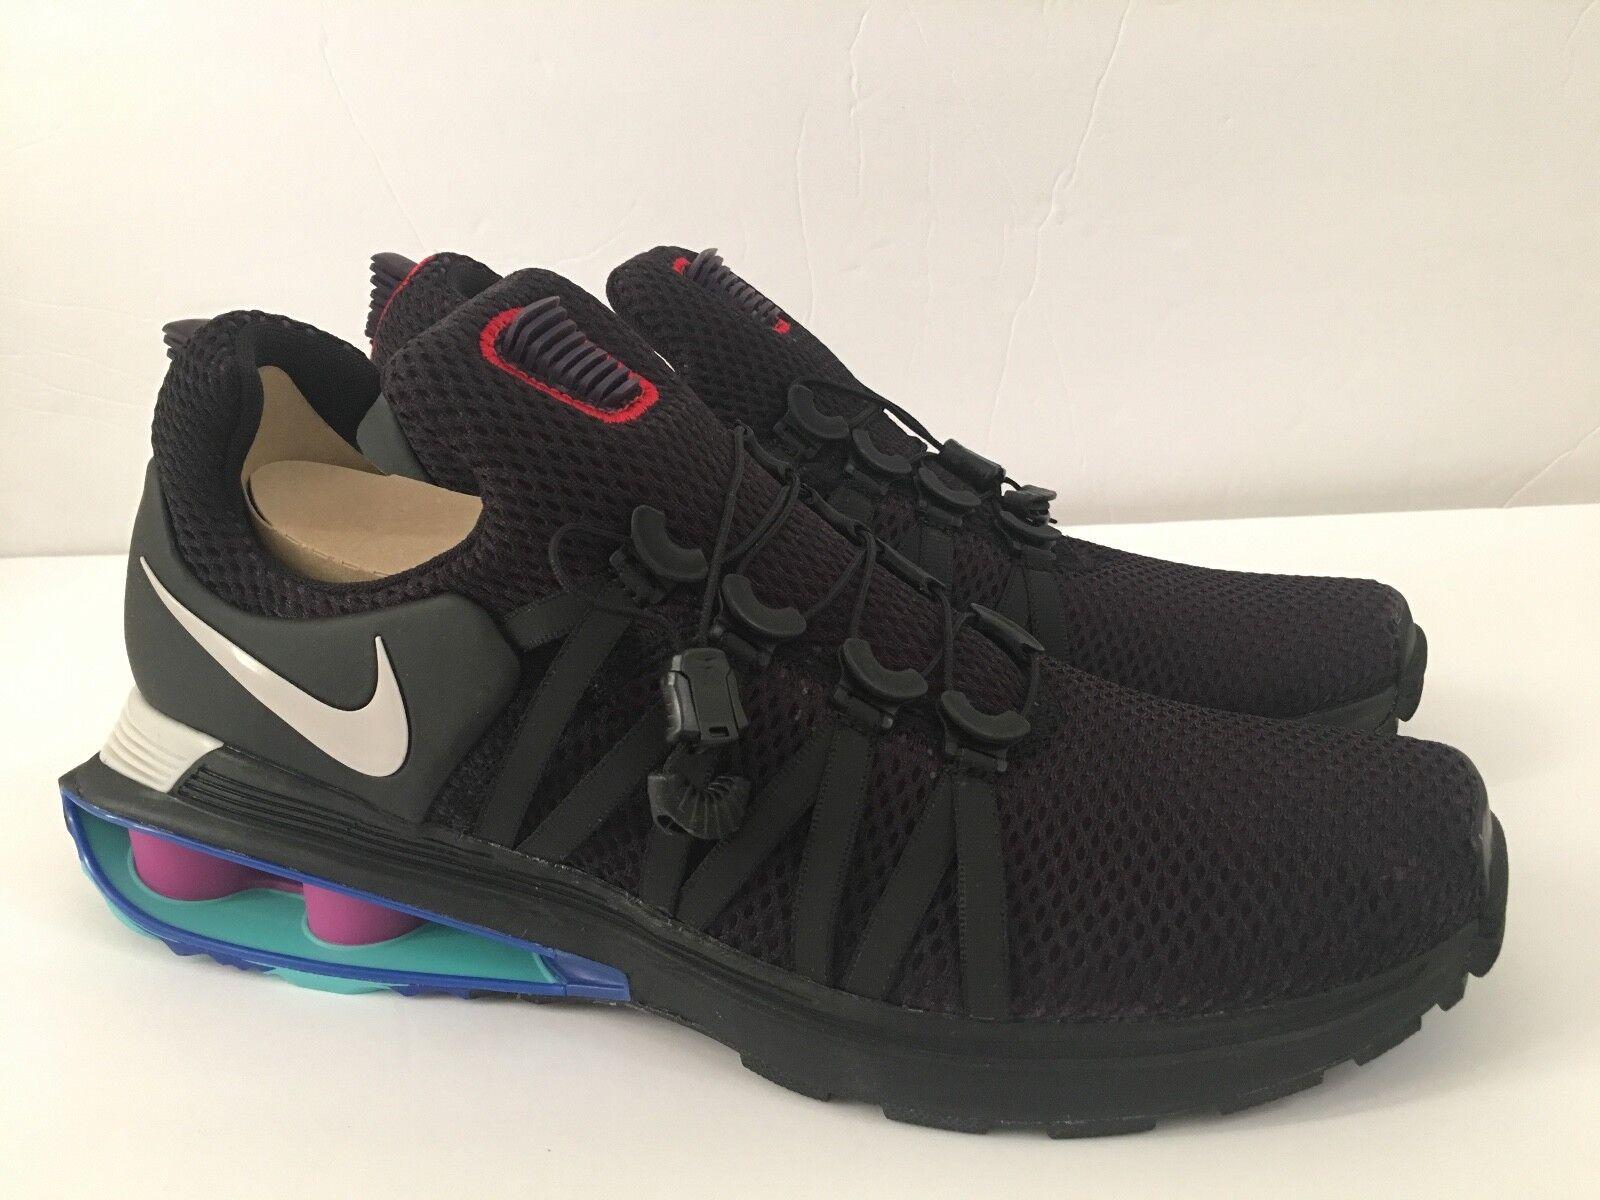 Nike Shox Gravity Mens Purple Grey Black Size 10 AR1999 500 Running Sneaker shoes